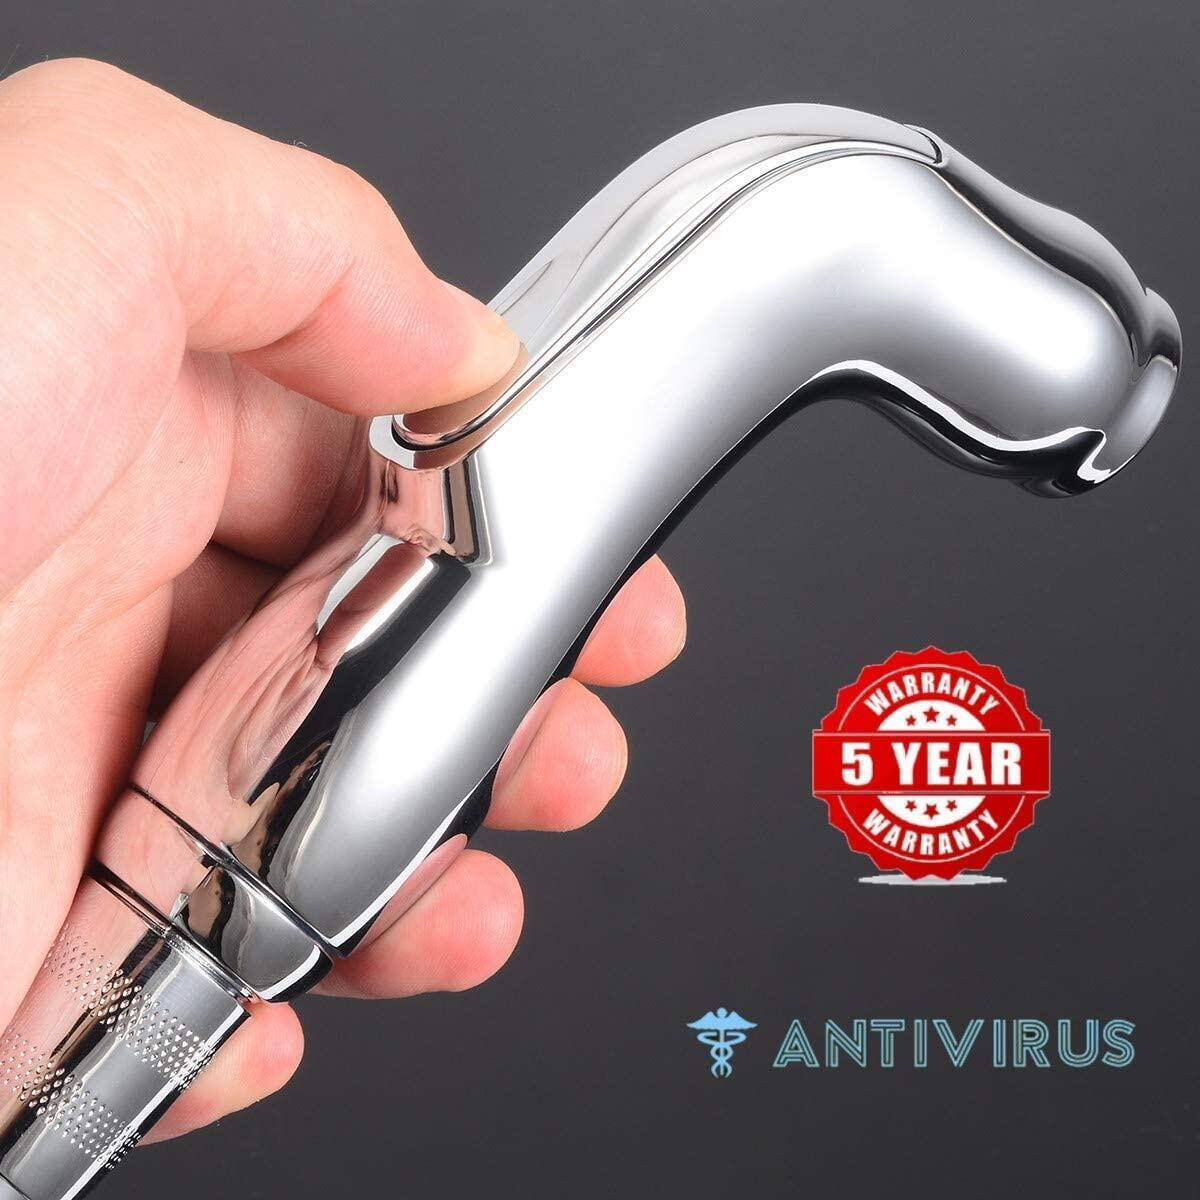 2020 New Multipurpose Cleaner - ANTIVIRUS - Leakproof Best Handheld Bidet Toilet Sprayer